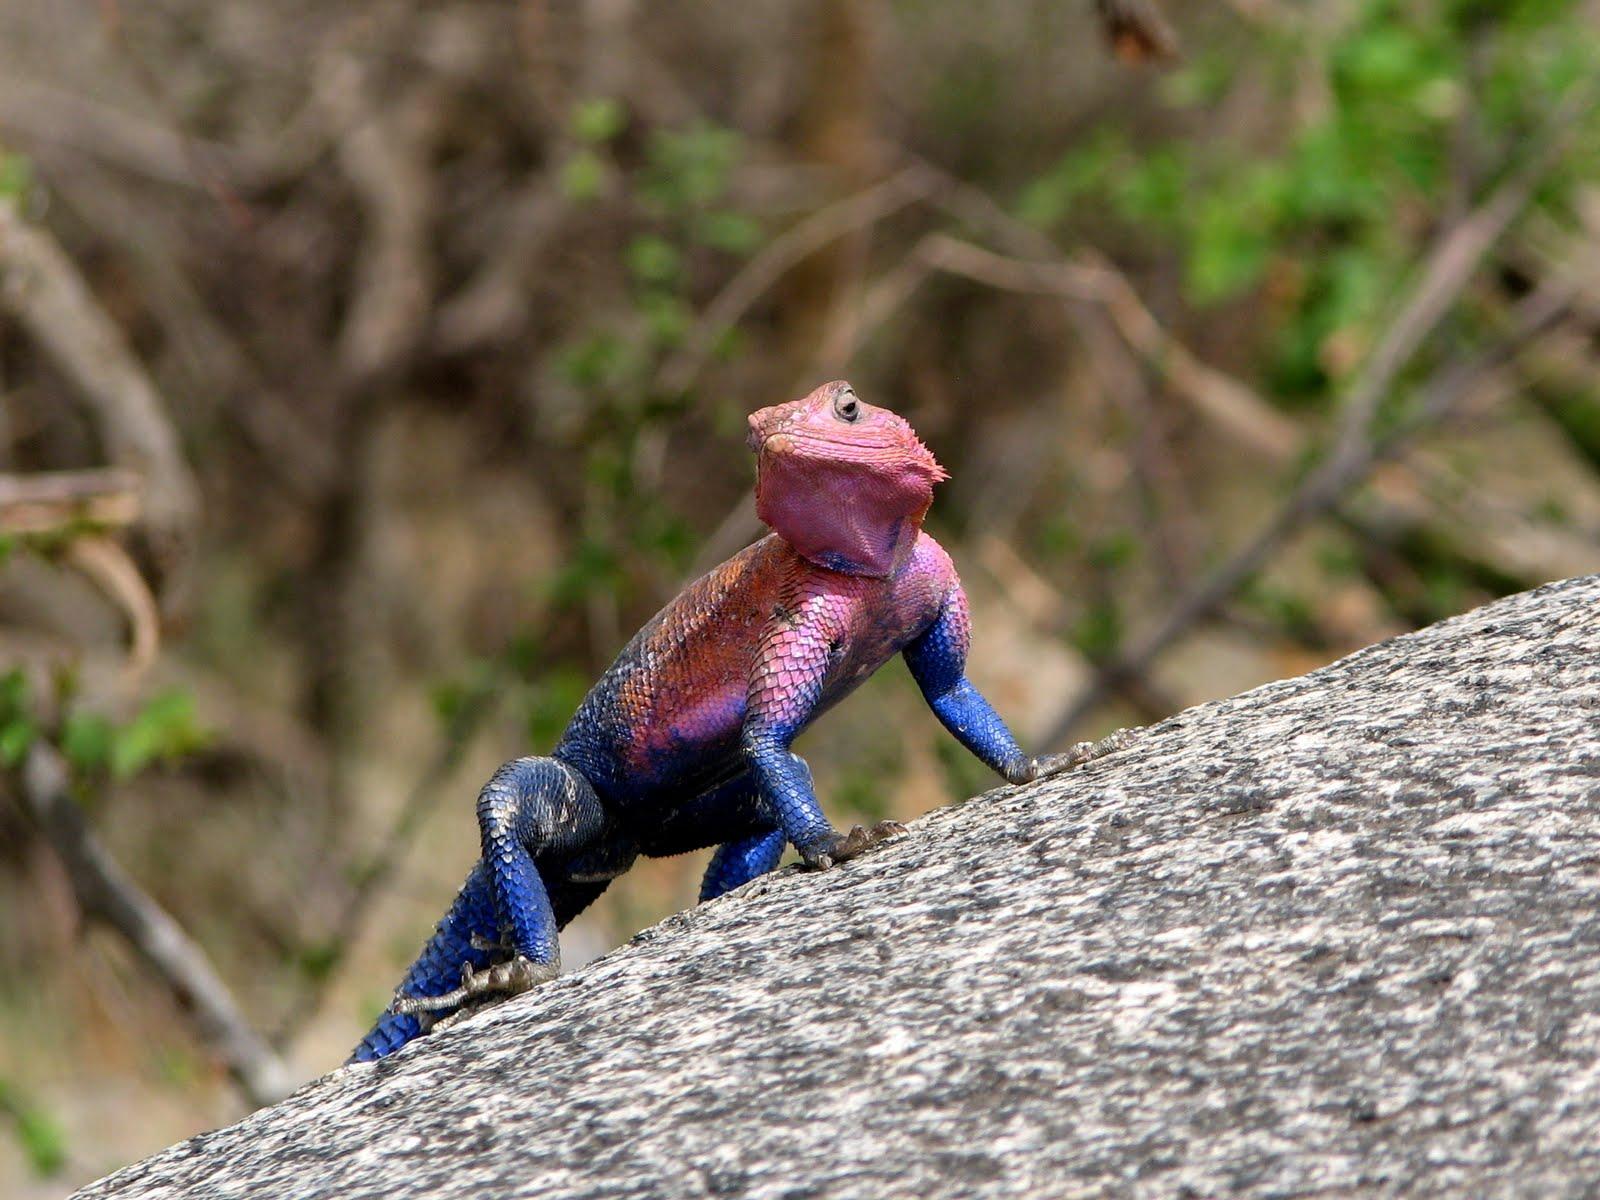 Agama manzea SpiderMan lookalike